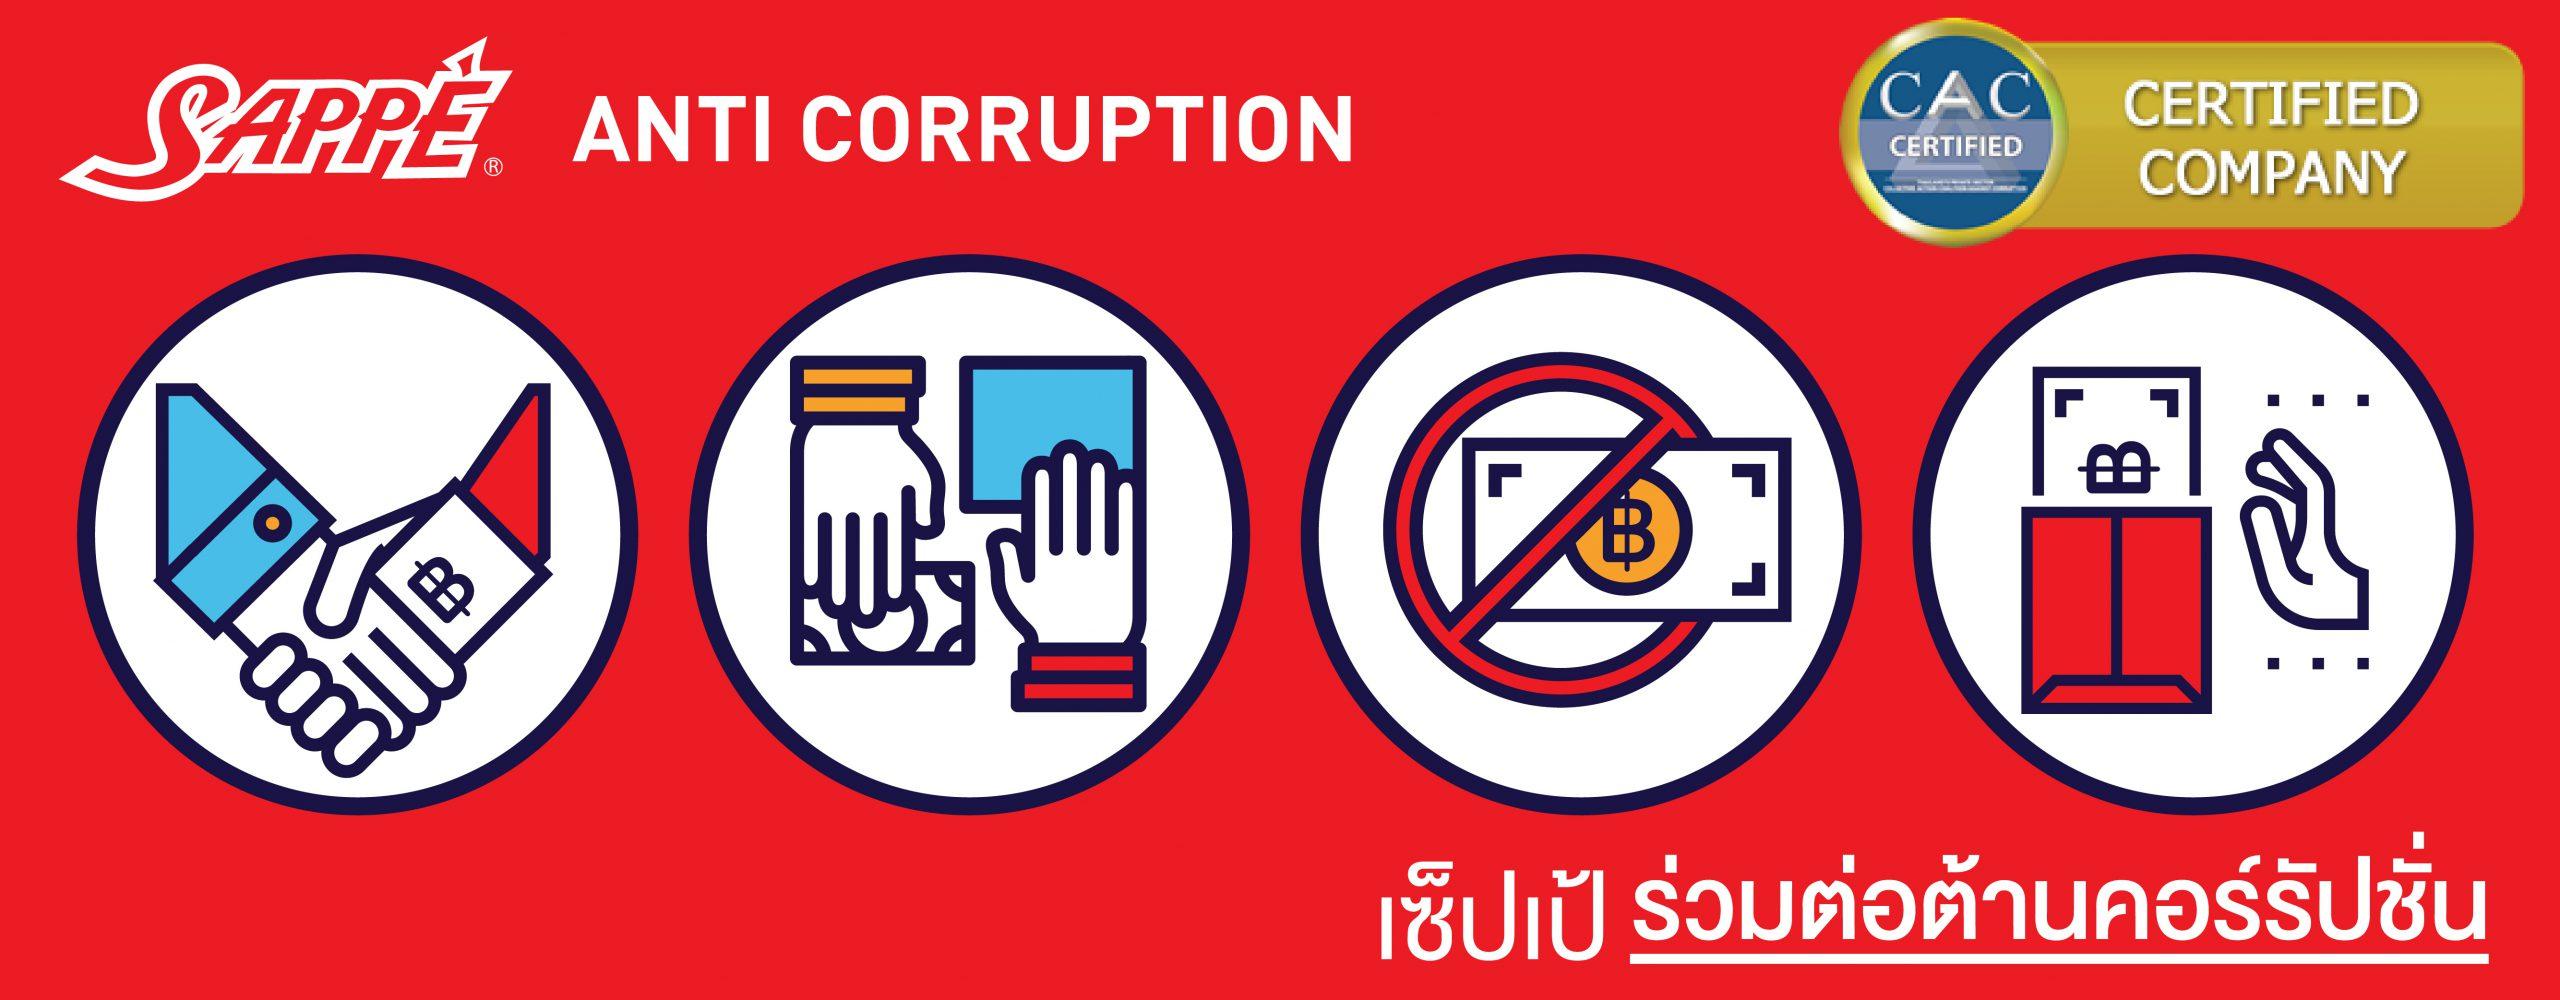 [:th]sappe-anticorruption[:]